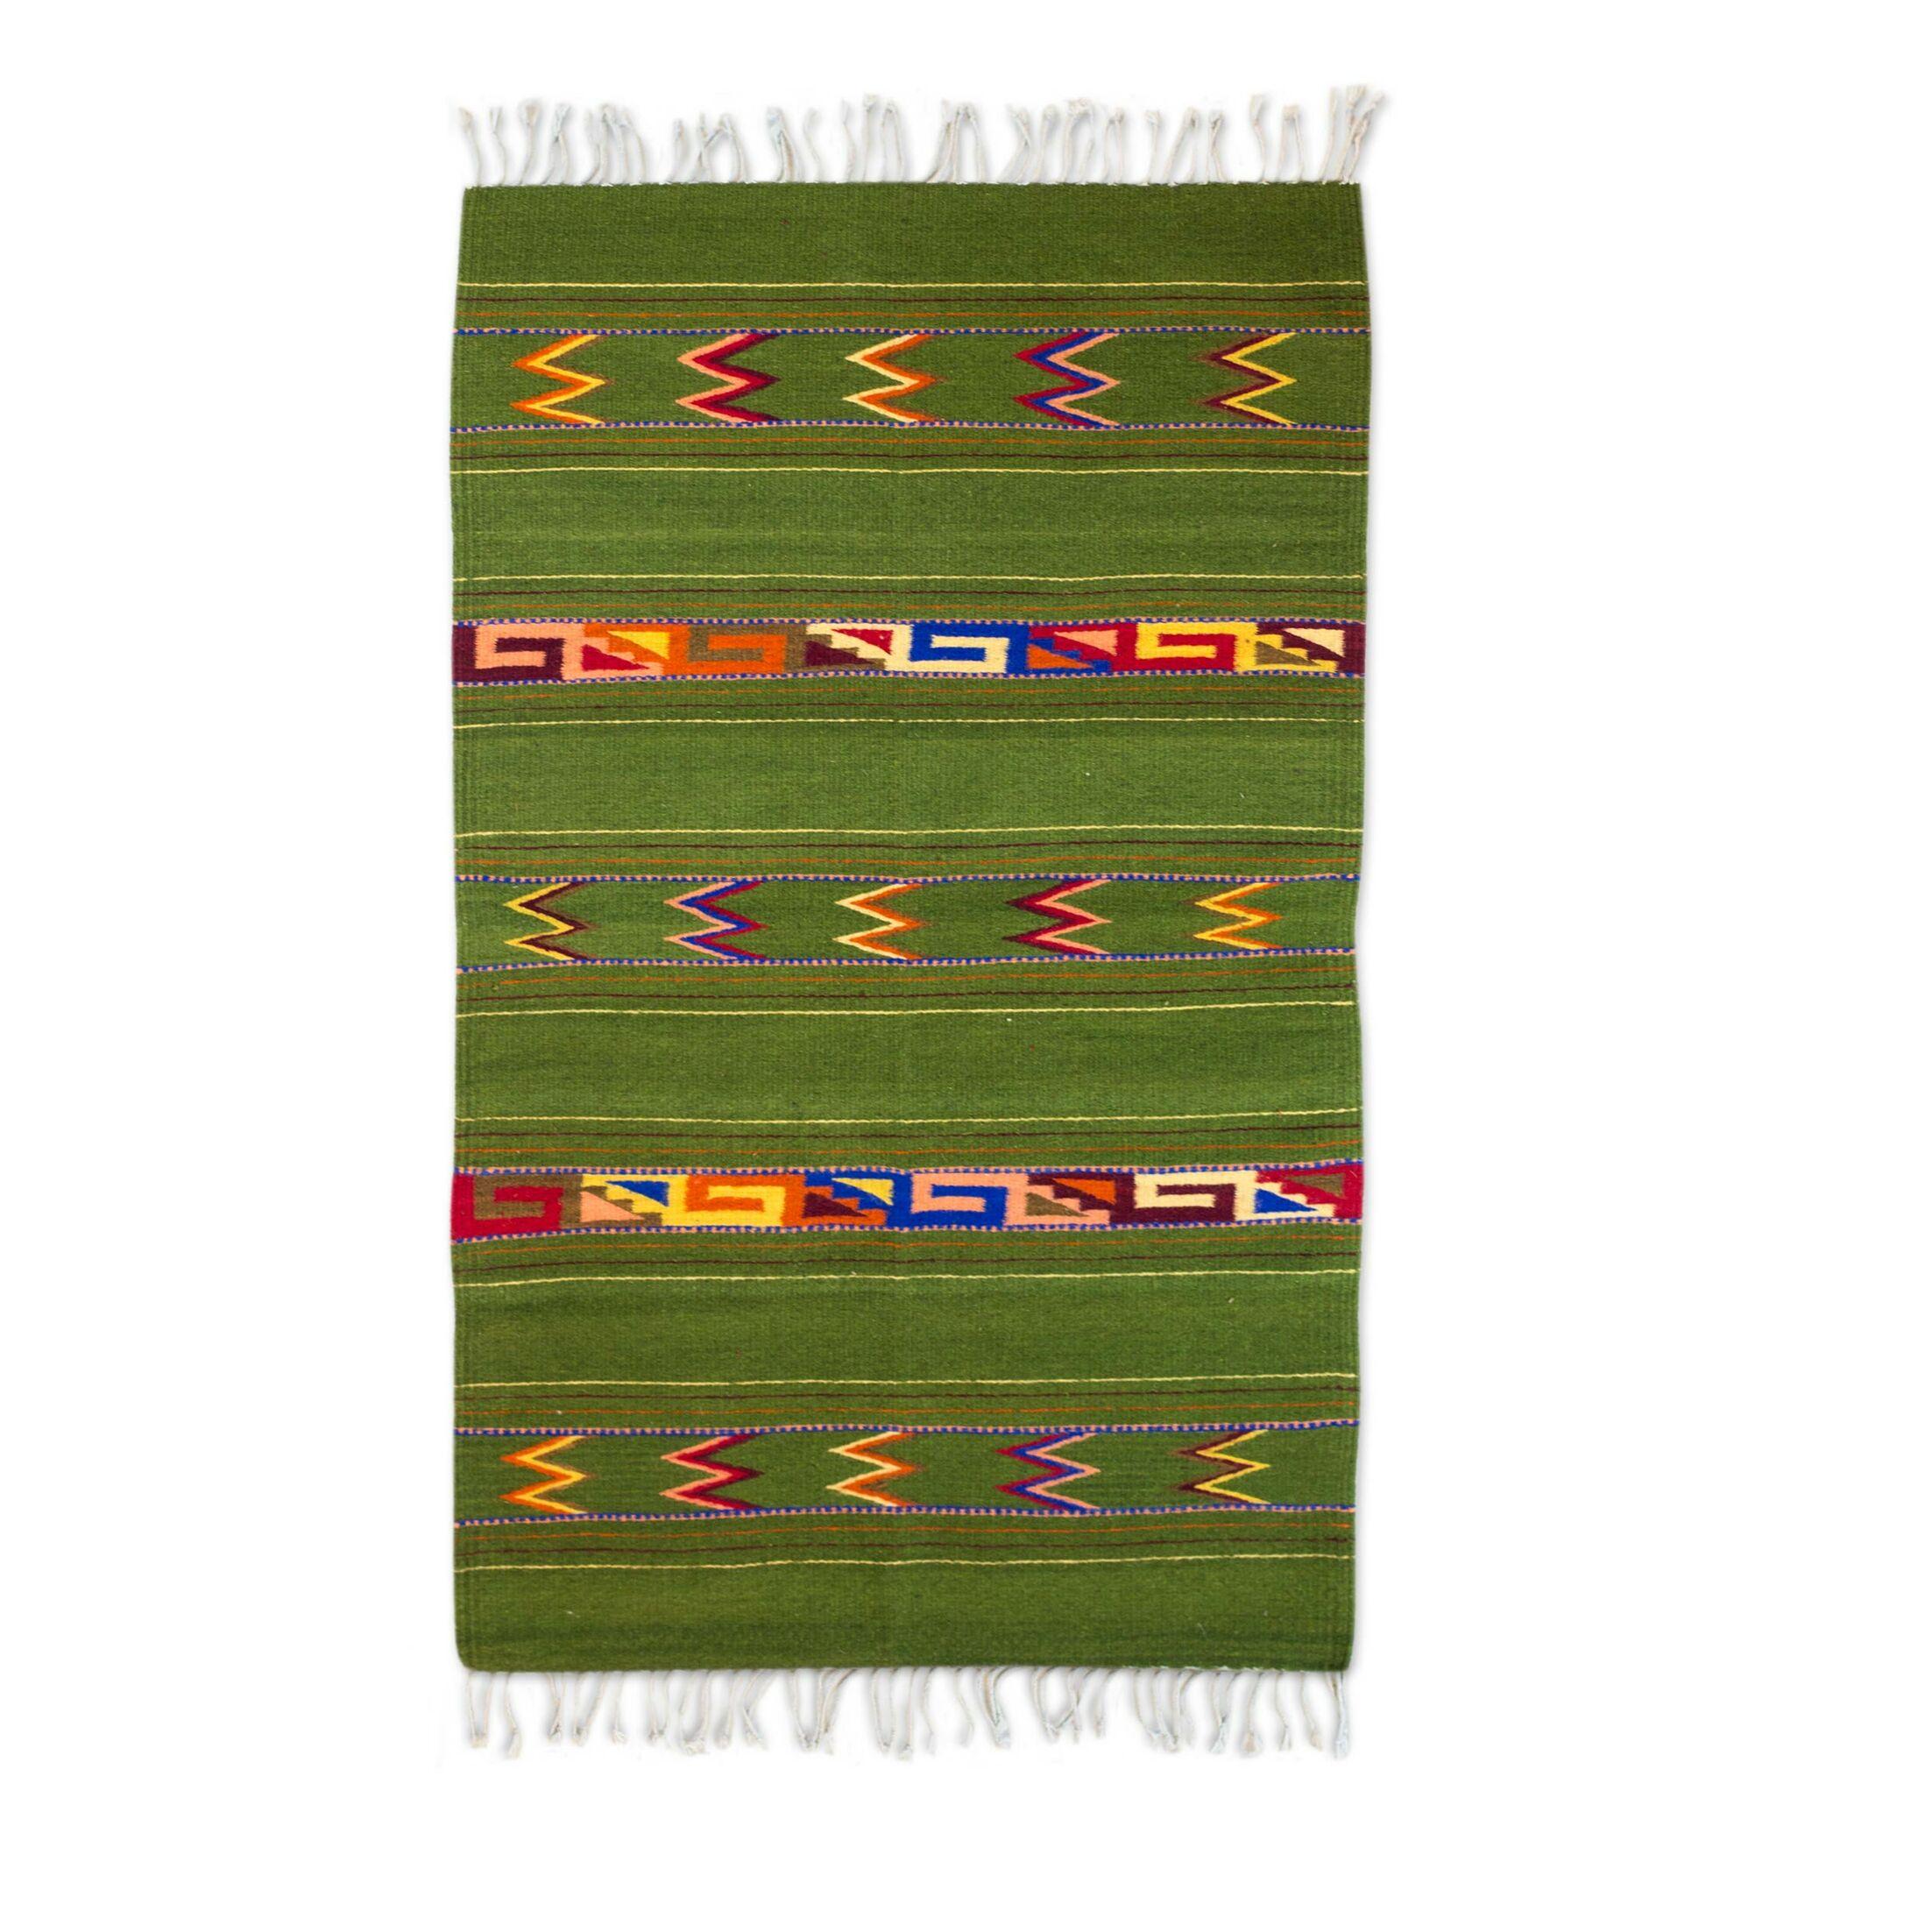 Weare Green Area Rug